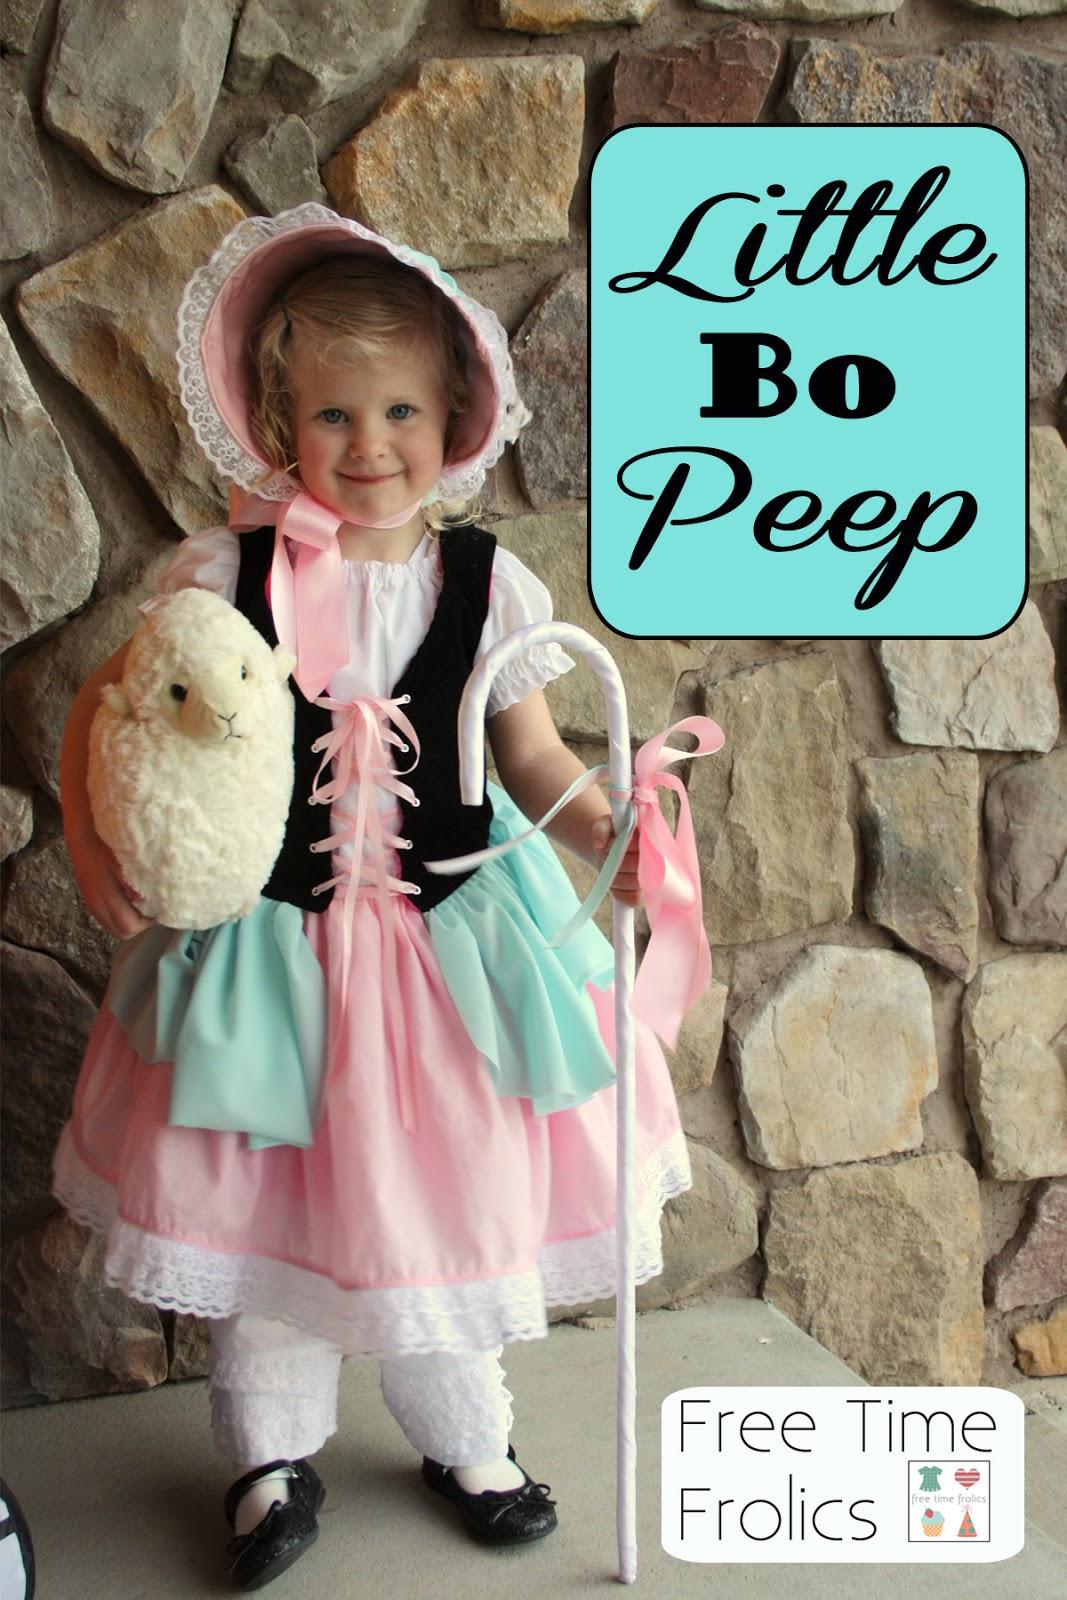 halloween costume -little bo peep - free time frolics